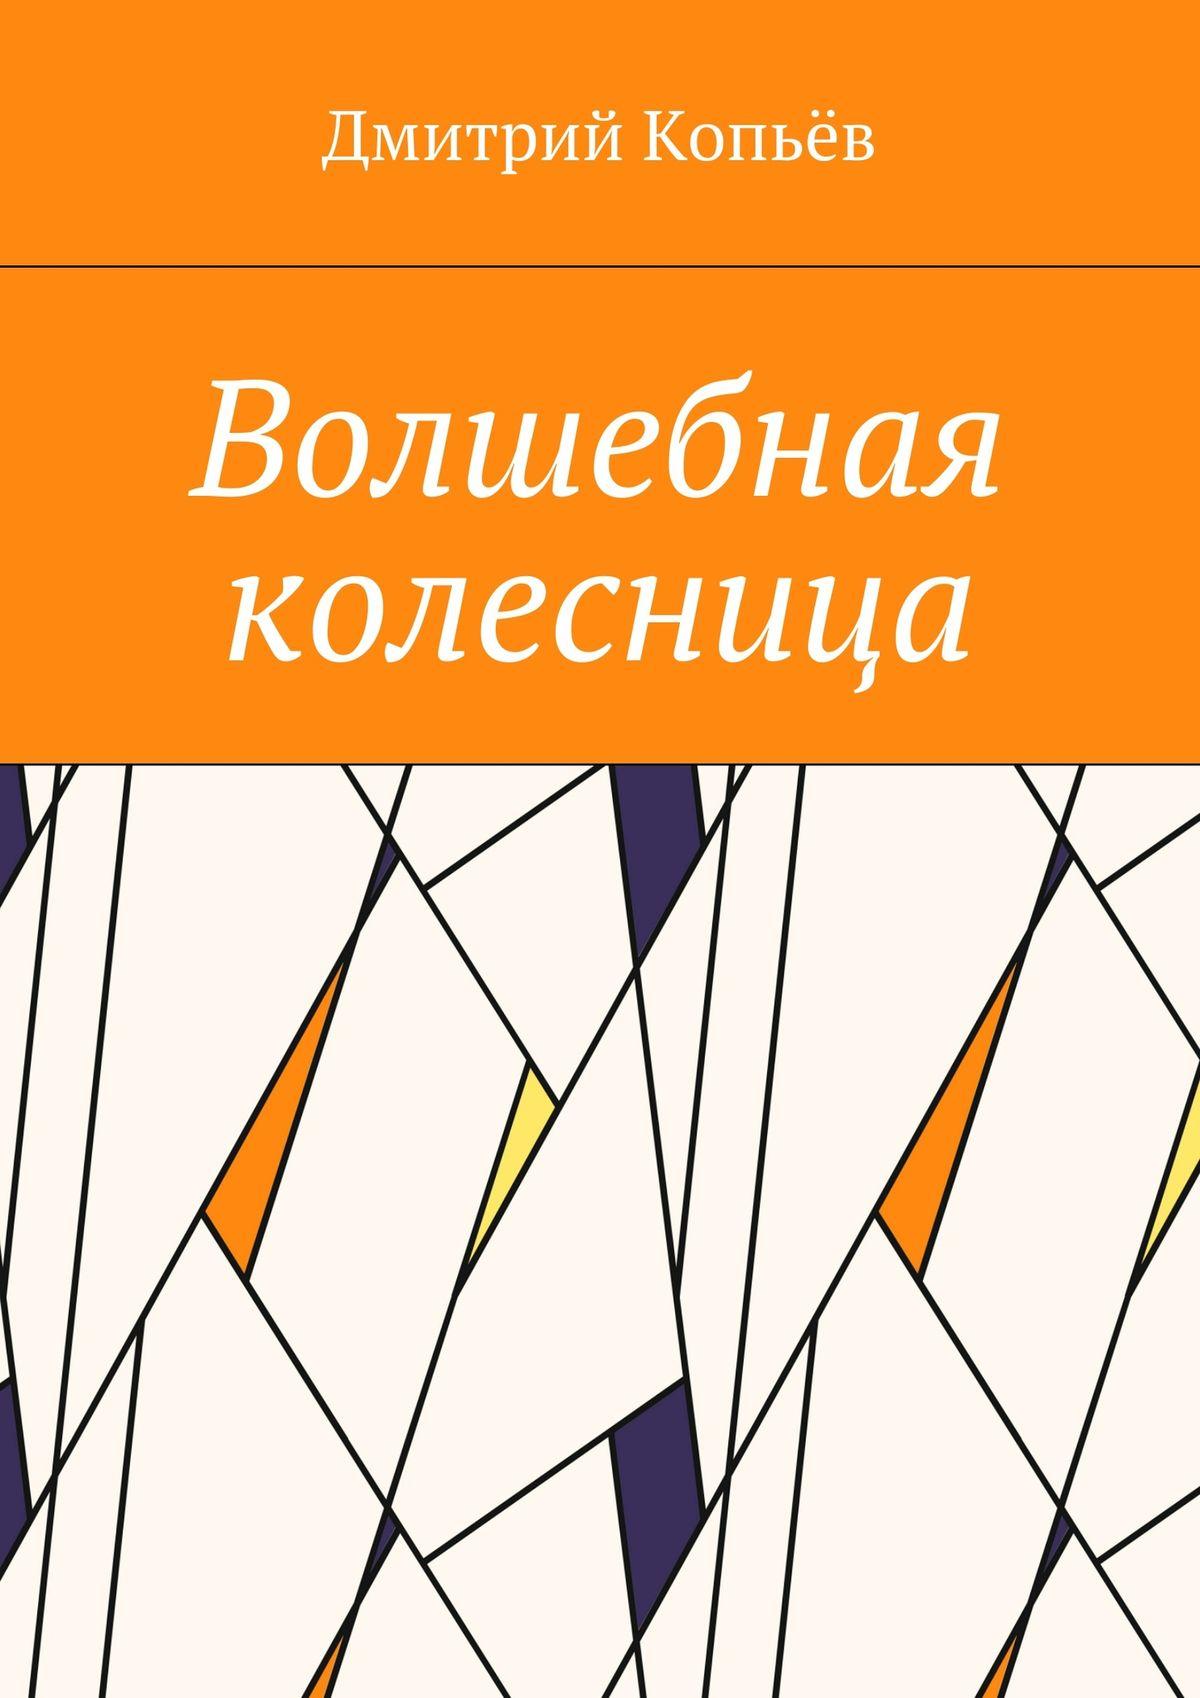 Дмитрий Копьёв Волшебная колесница fotoniobox лайтбокс египетская колесница 35x35 135